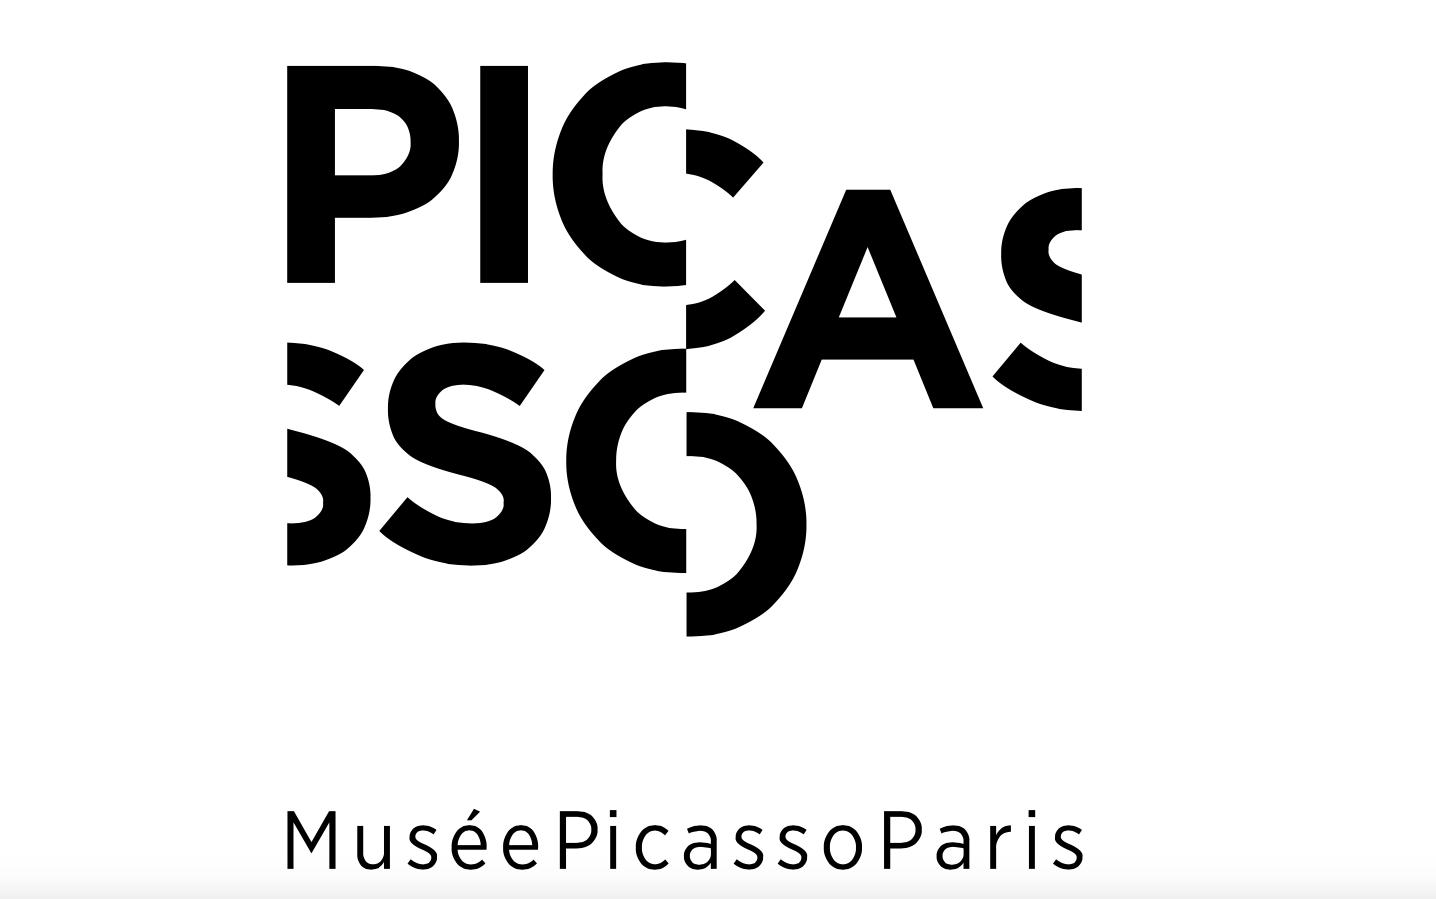 picasso2-1024x641